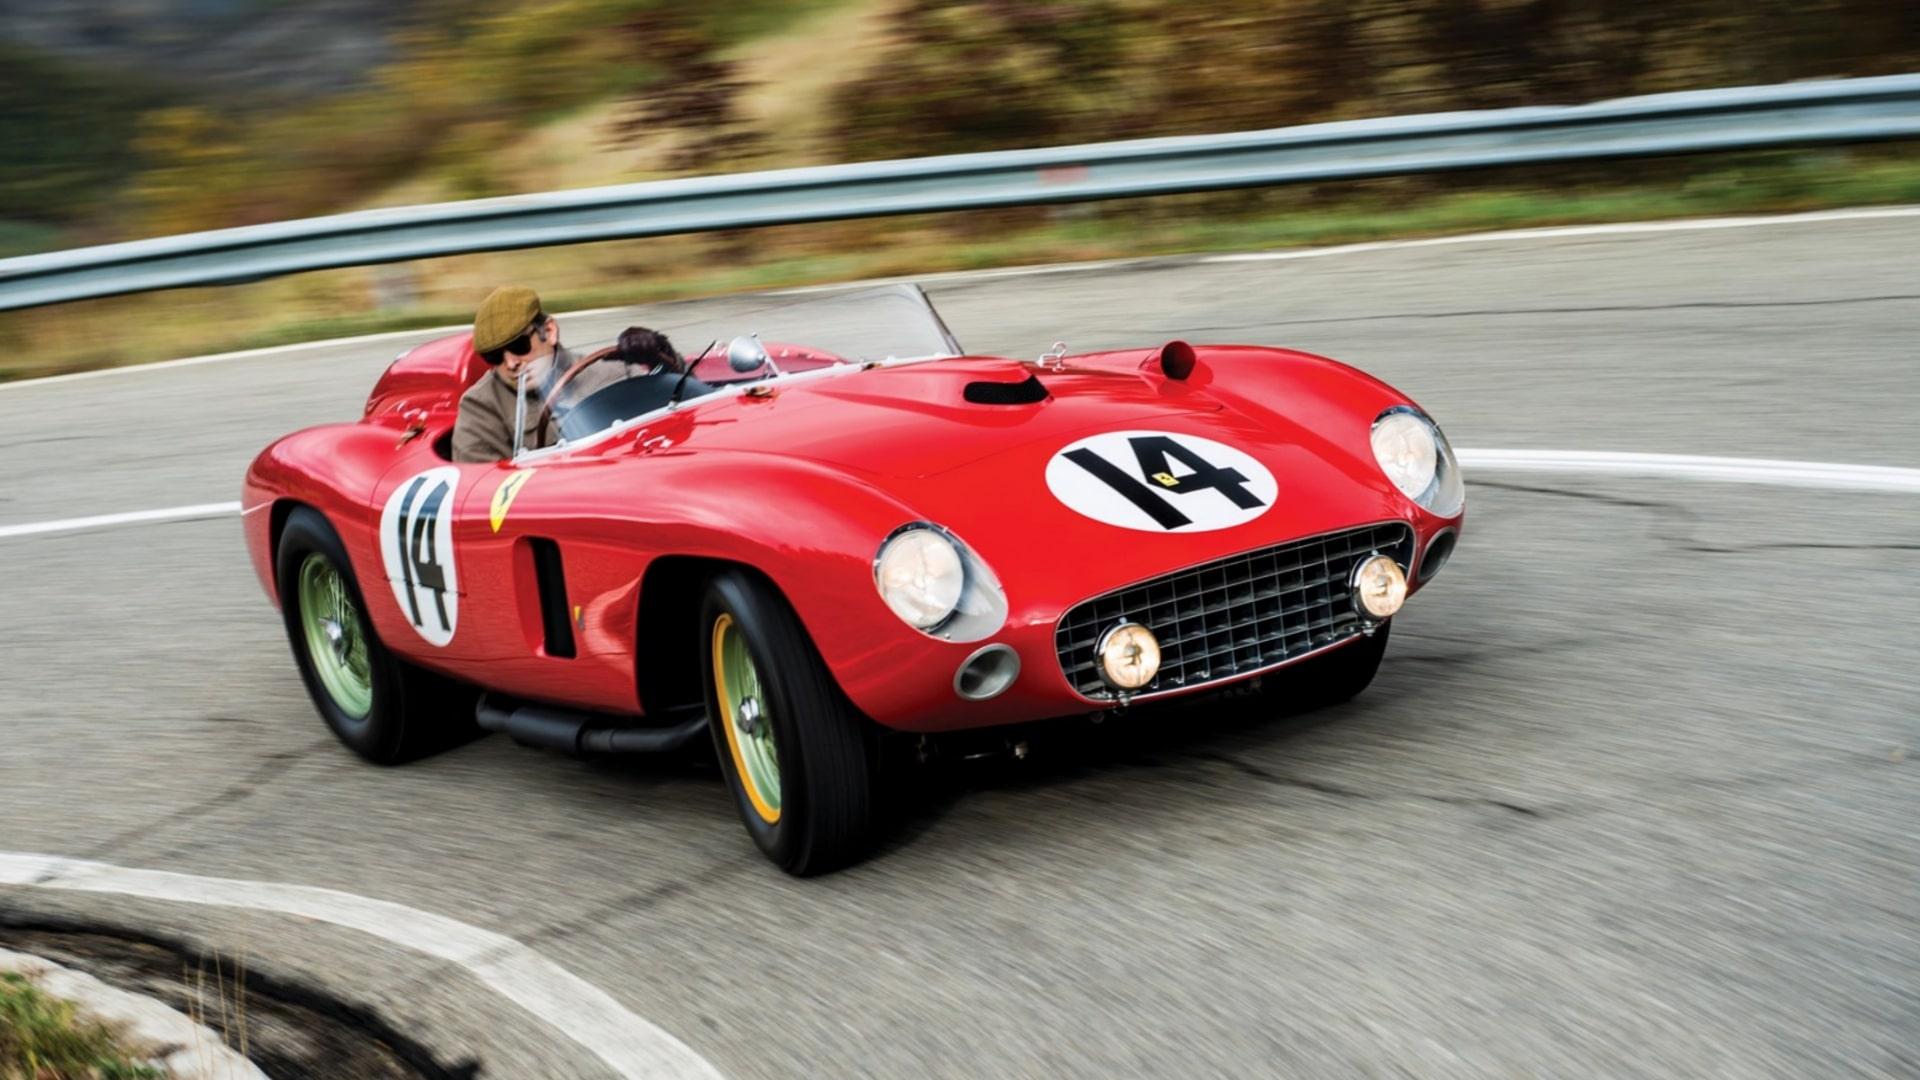 Ferrari racing car sells for $22 million RM Sotheby's